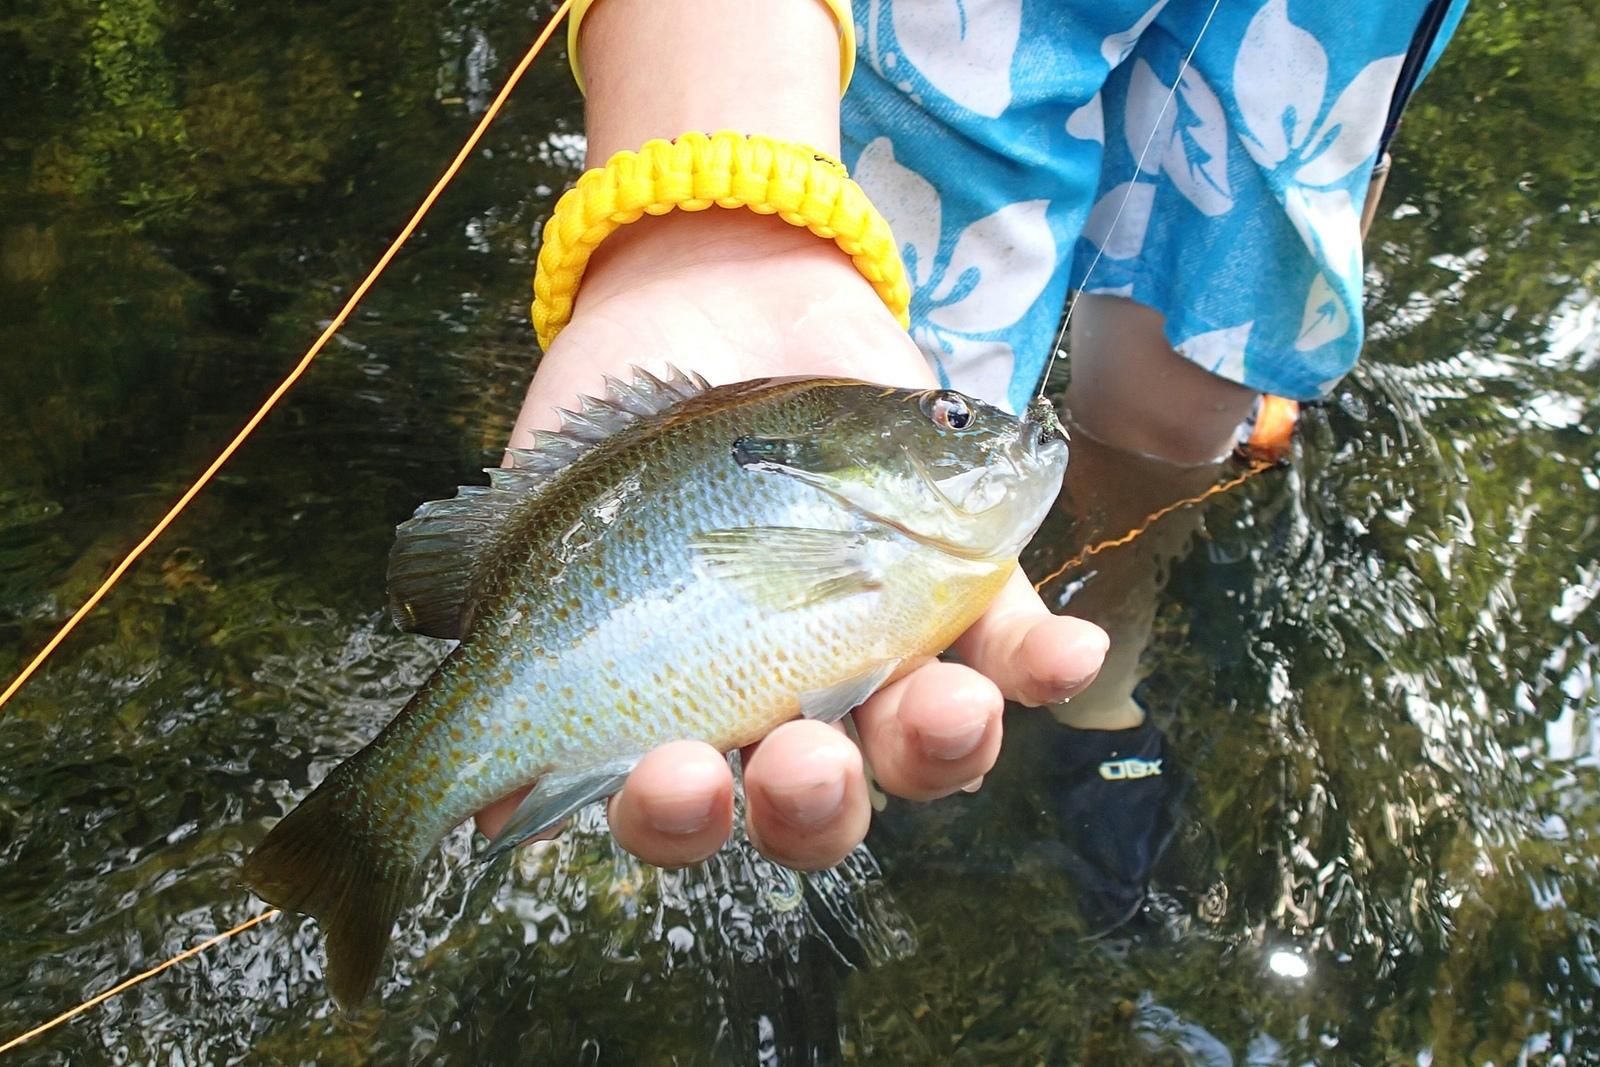 21680e73345f40a853e1_fishing_Project_Healing_Waters_Fly_Fishing_-_Northern_VA.JPG